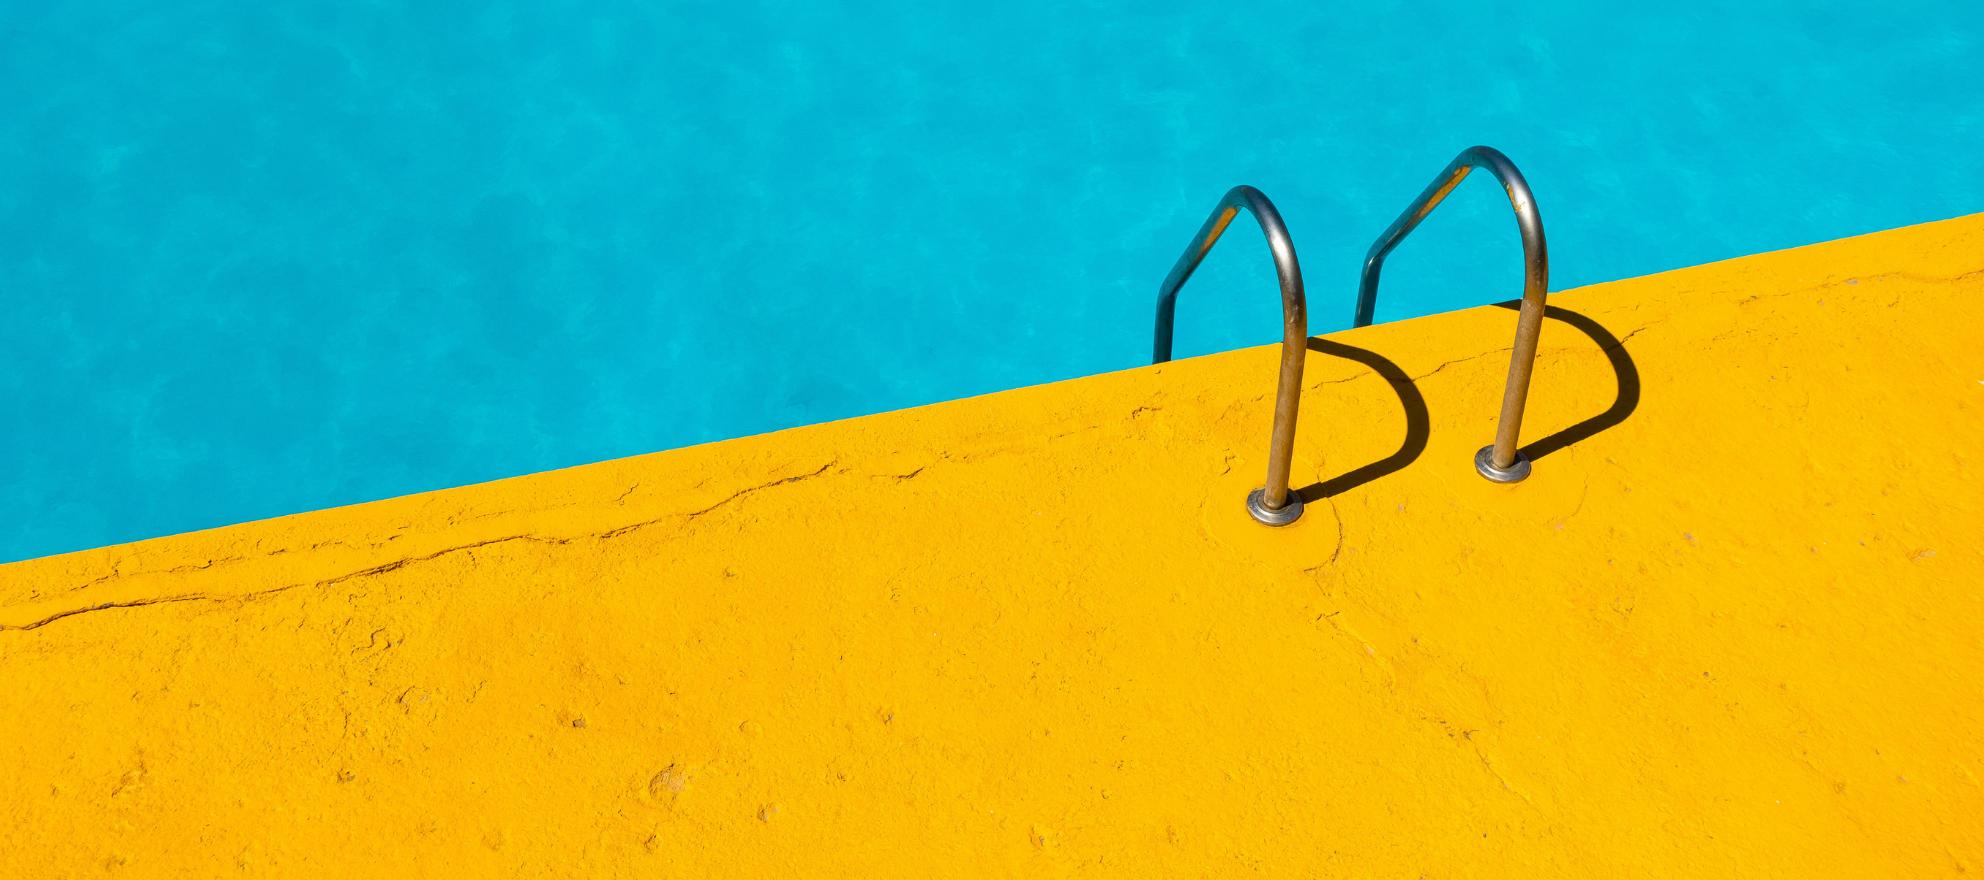 Judge rules against condo board's discriminatory swimming pool rule